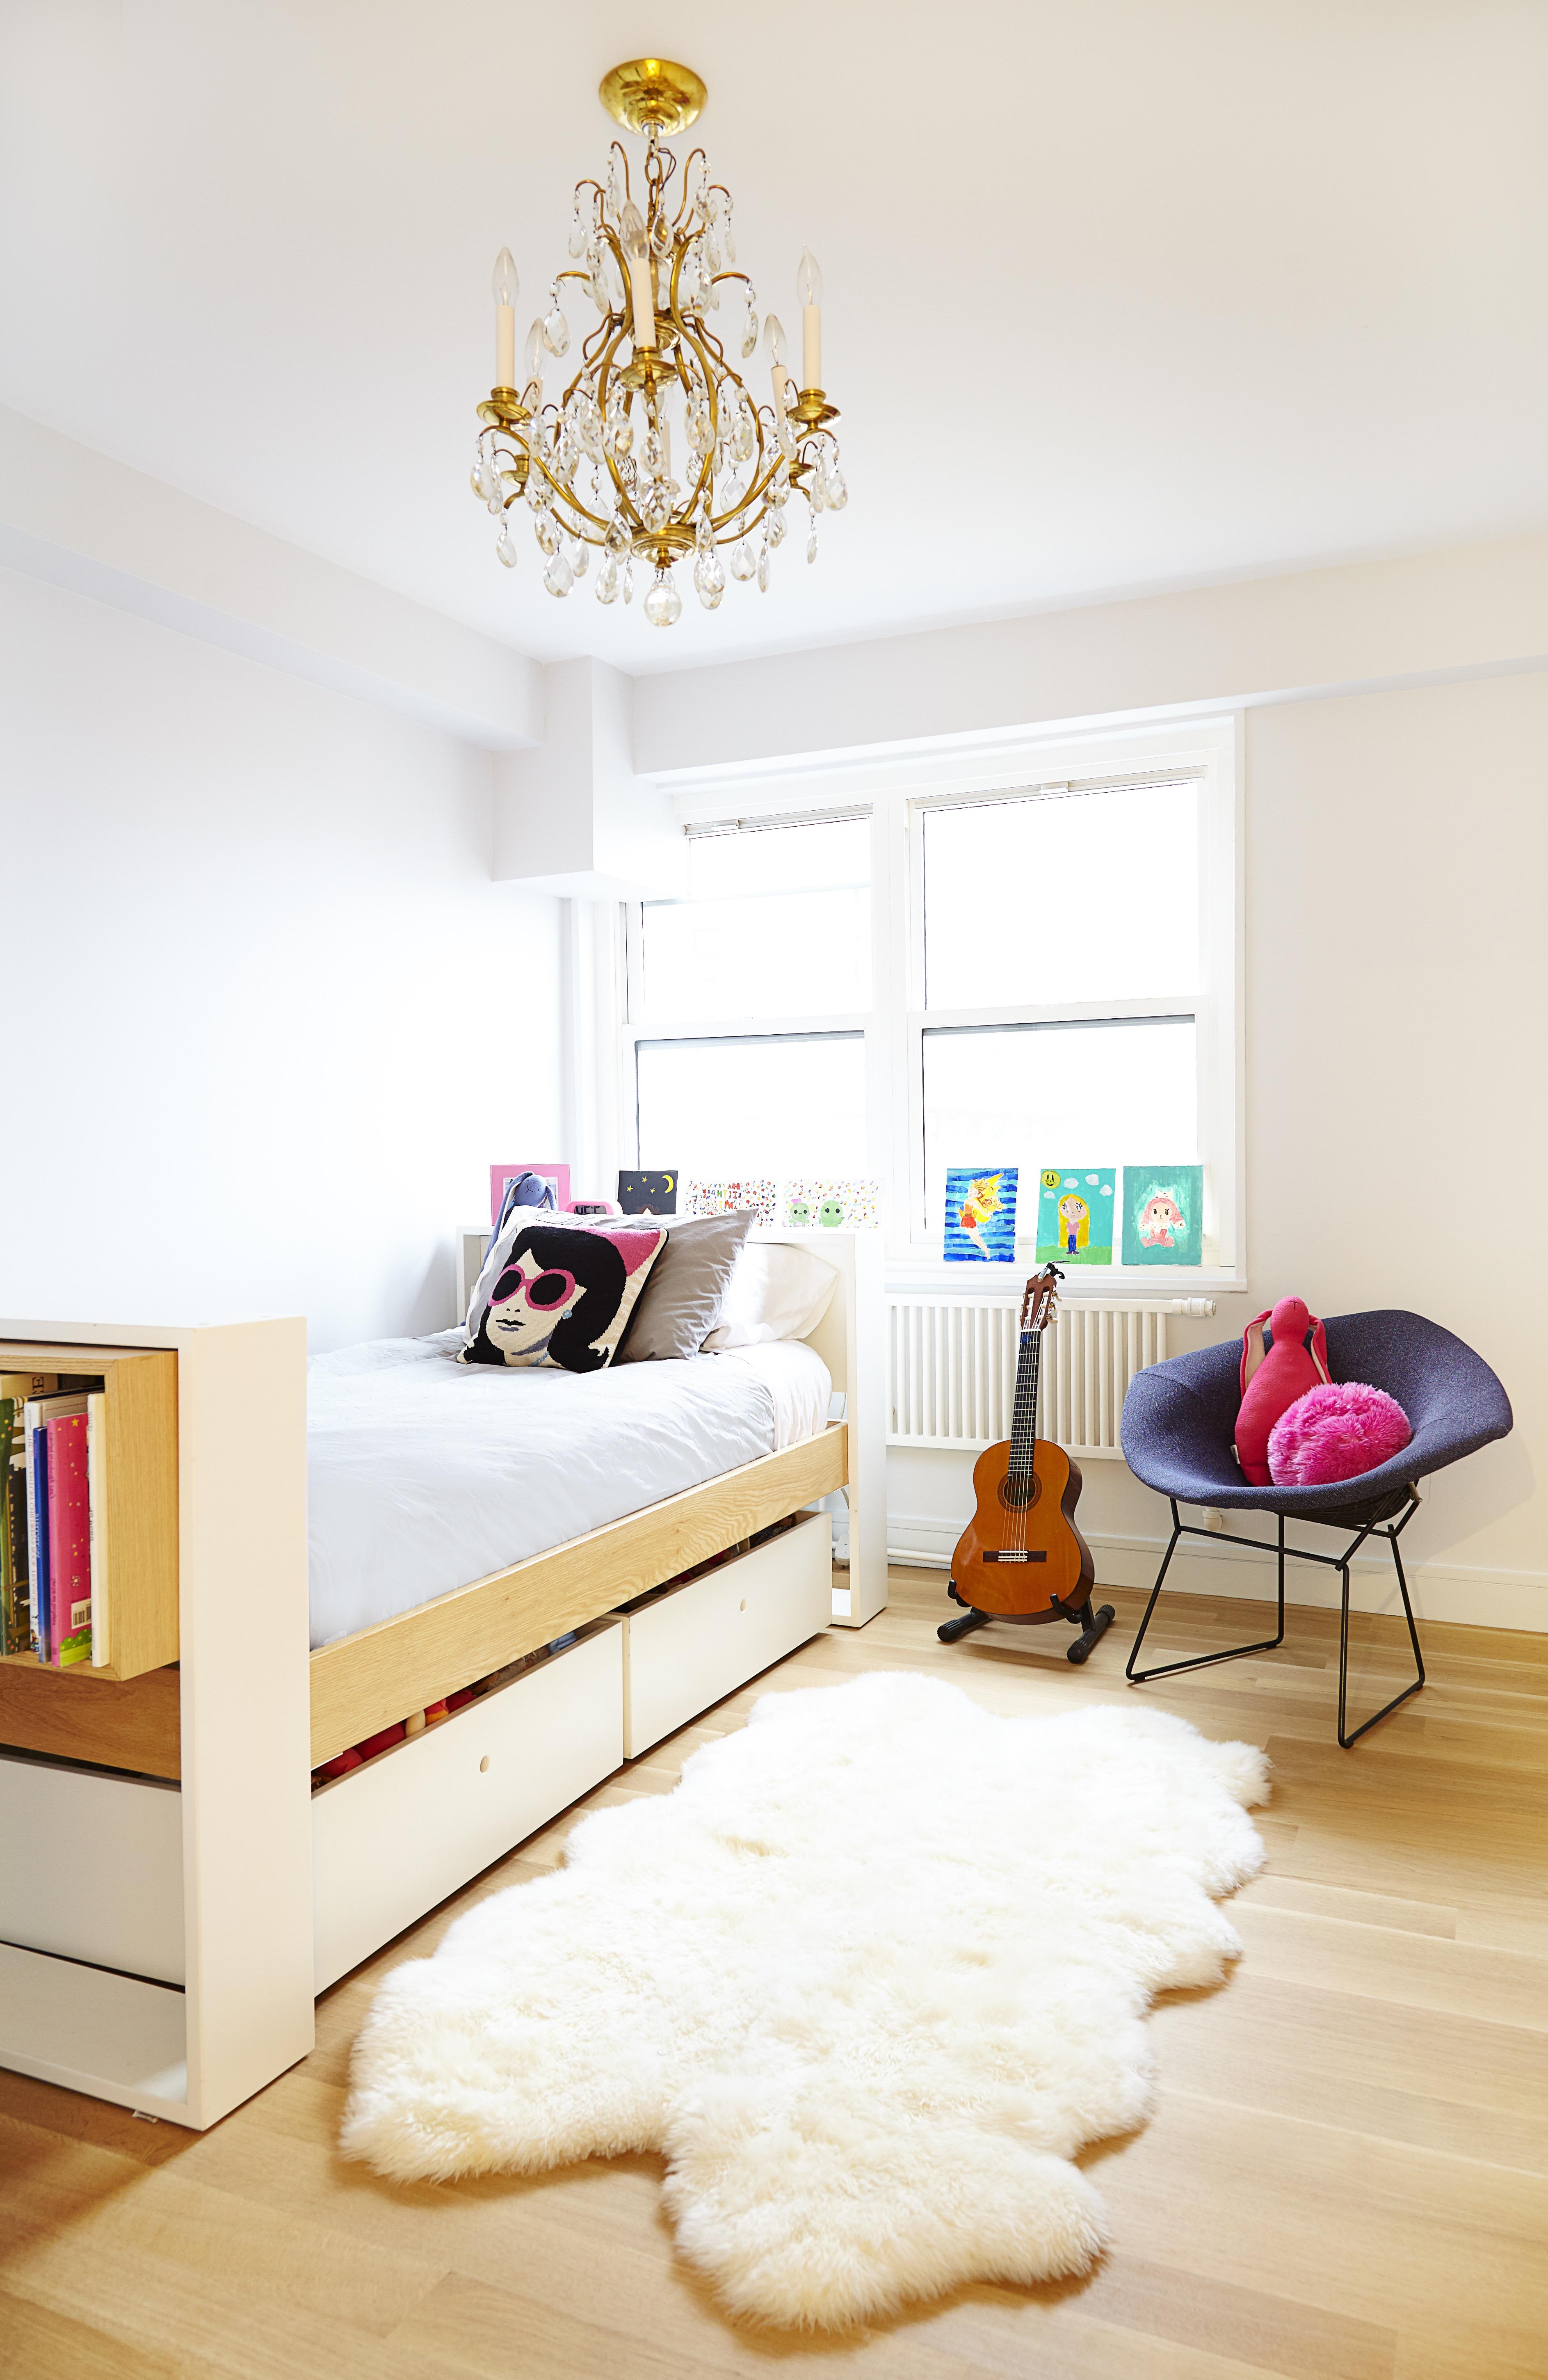 Fun Ideas For A Teenage Girl's Bedroom Decor #16535 ... on Girls Room Decoration  id=54667